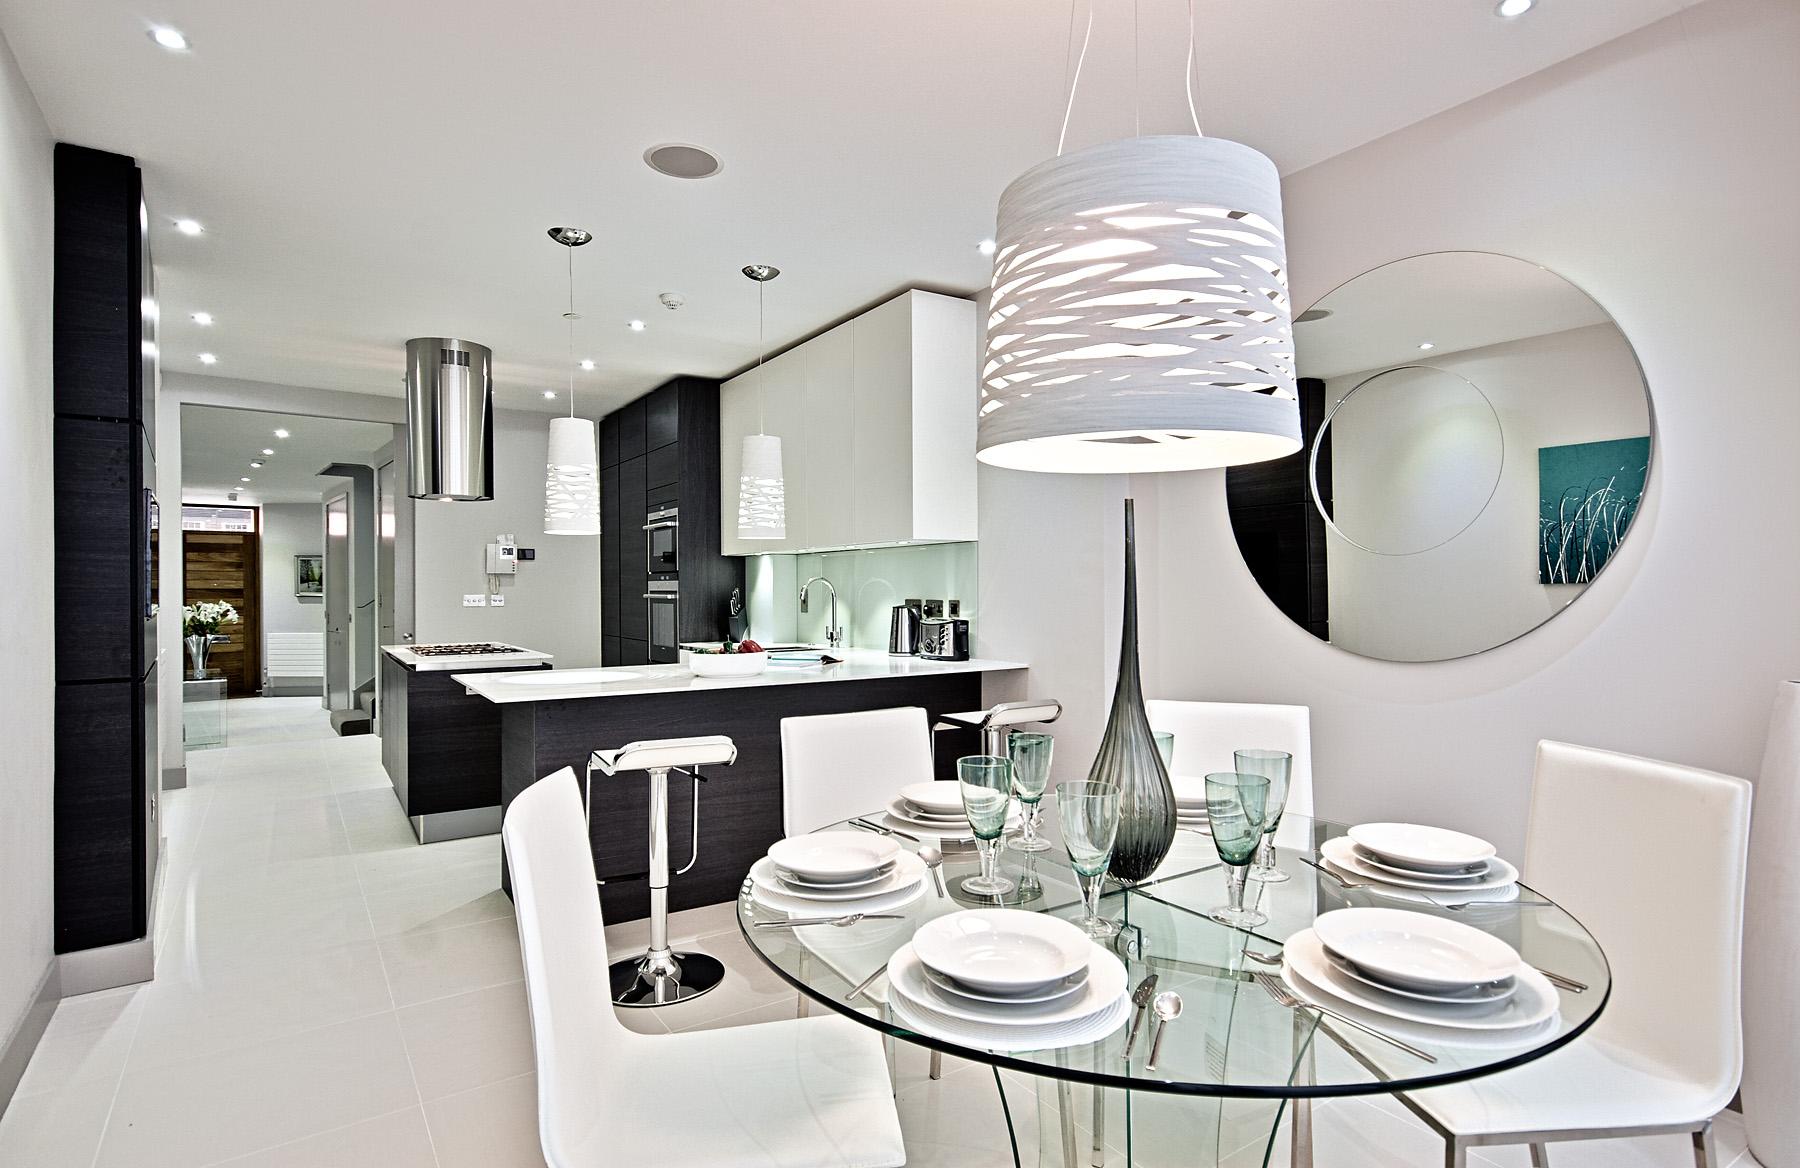 Furnishing interior design garton jones for Design services london